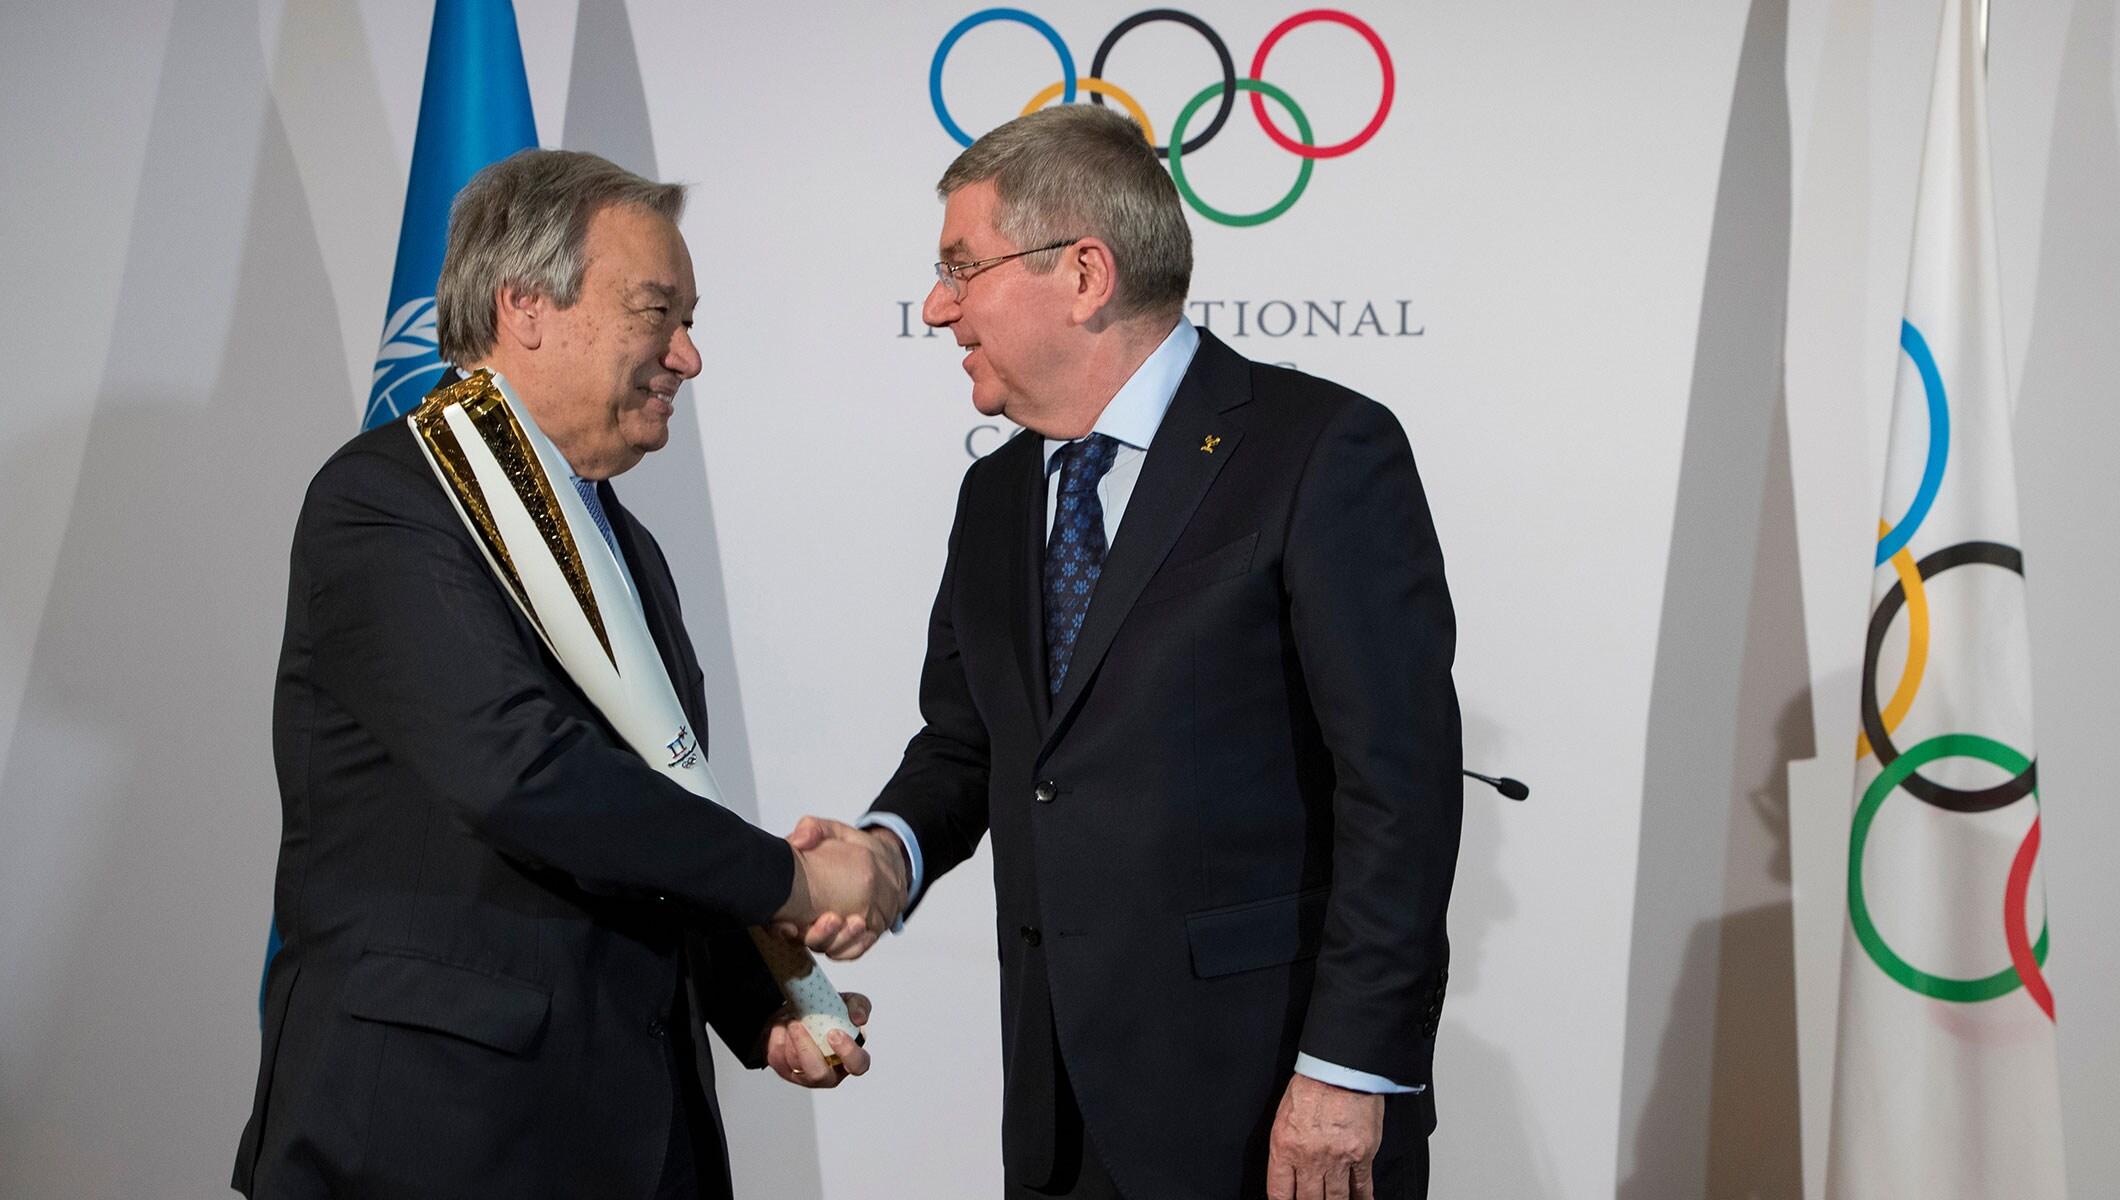 United Nations Secretary-General praises IOC